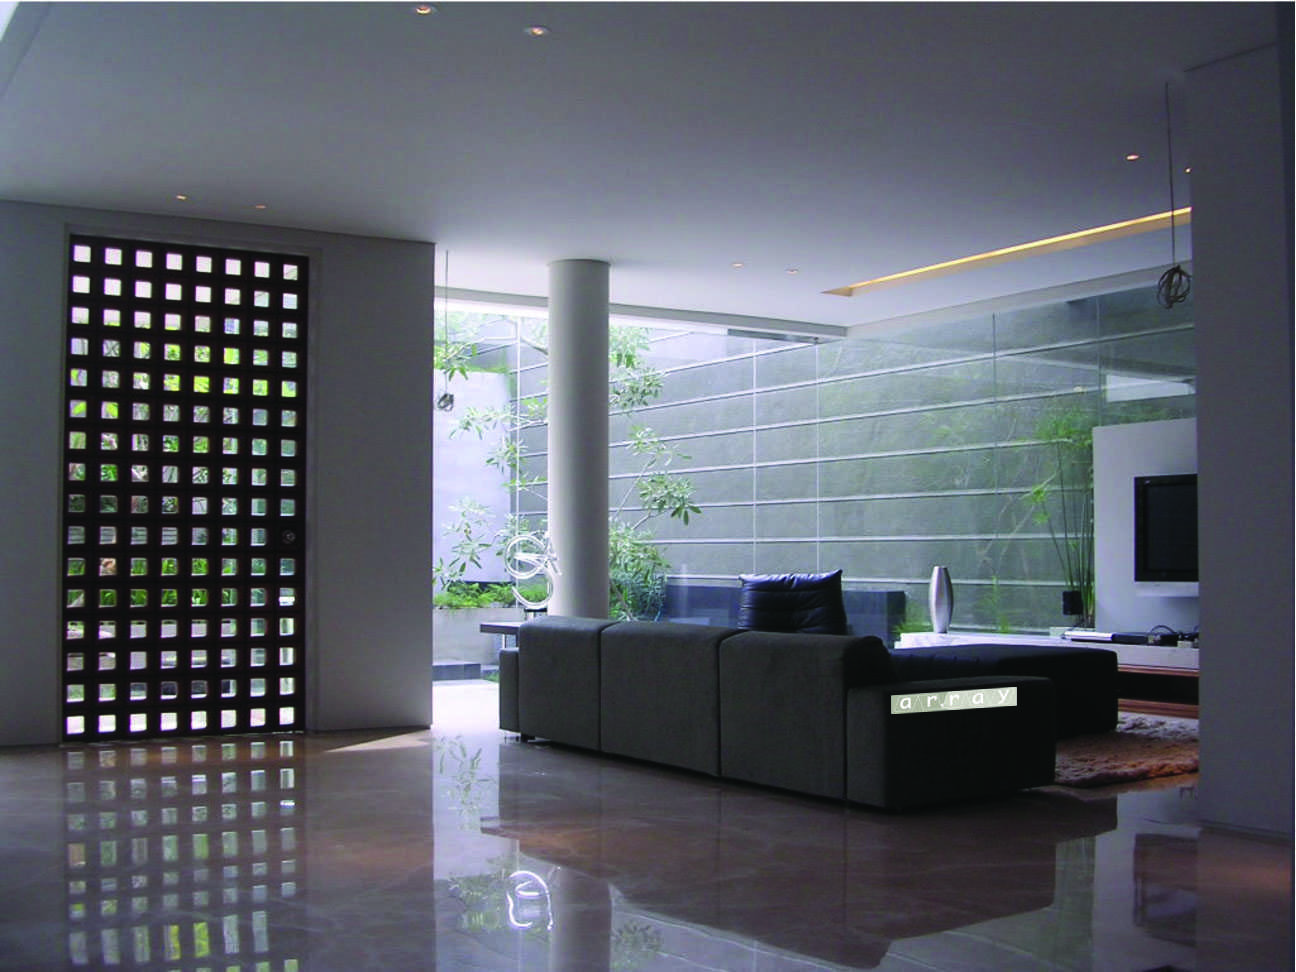 Array Pantai Mutiara Resident Pantai Mutiara Pantai Mutiara Interior Living Room Panmut  Interior Living Room 15662